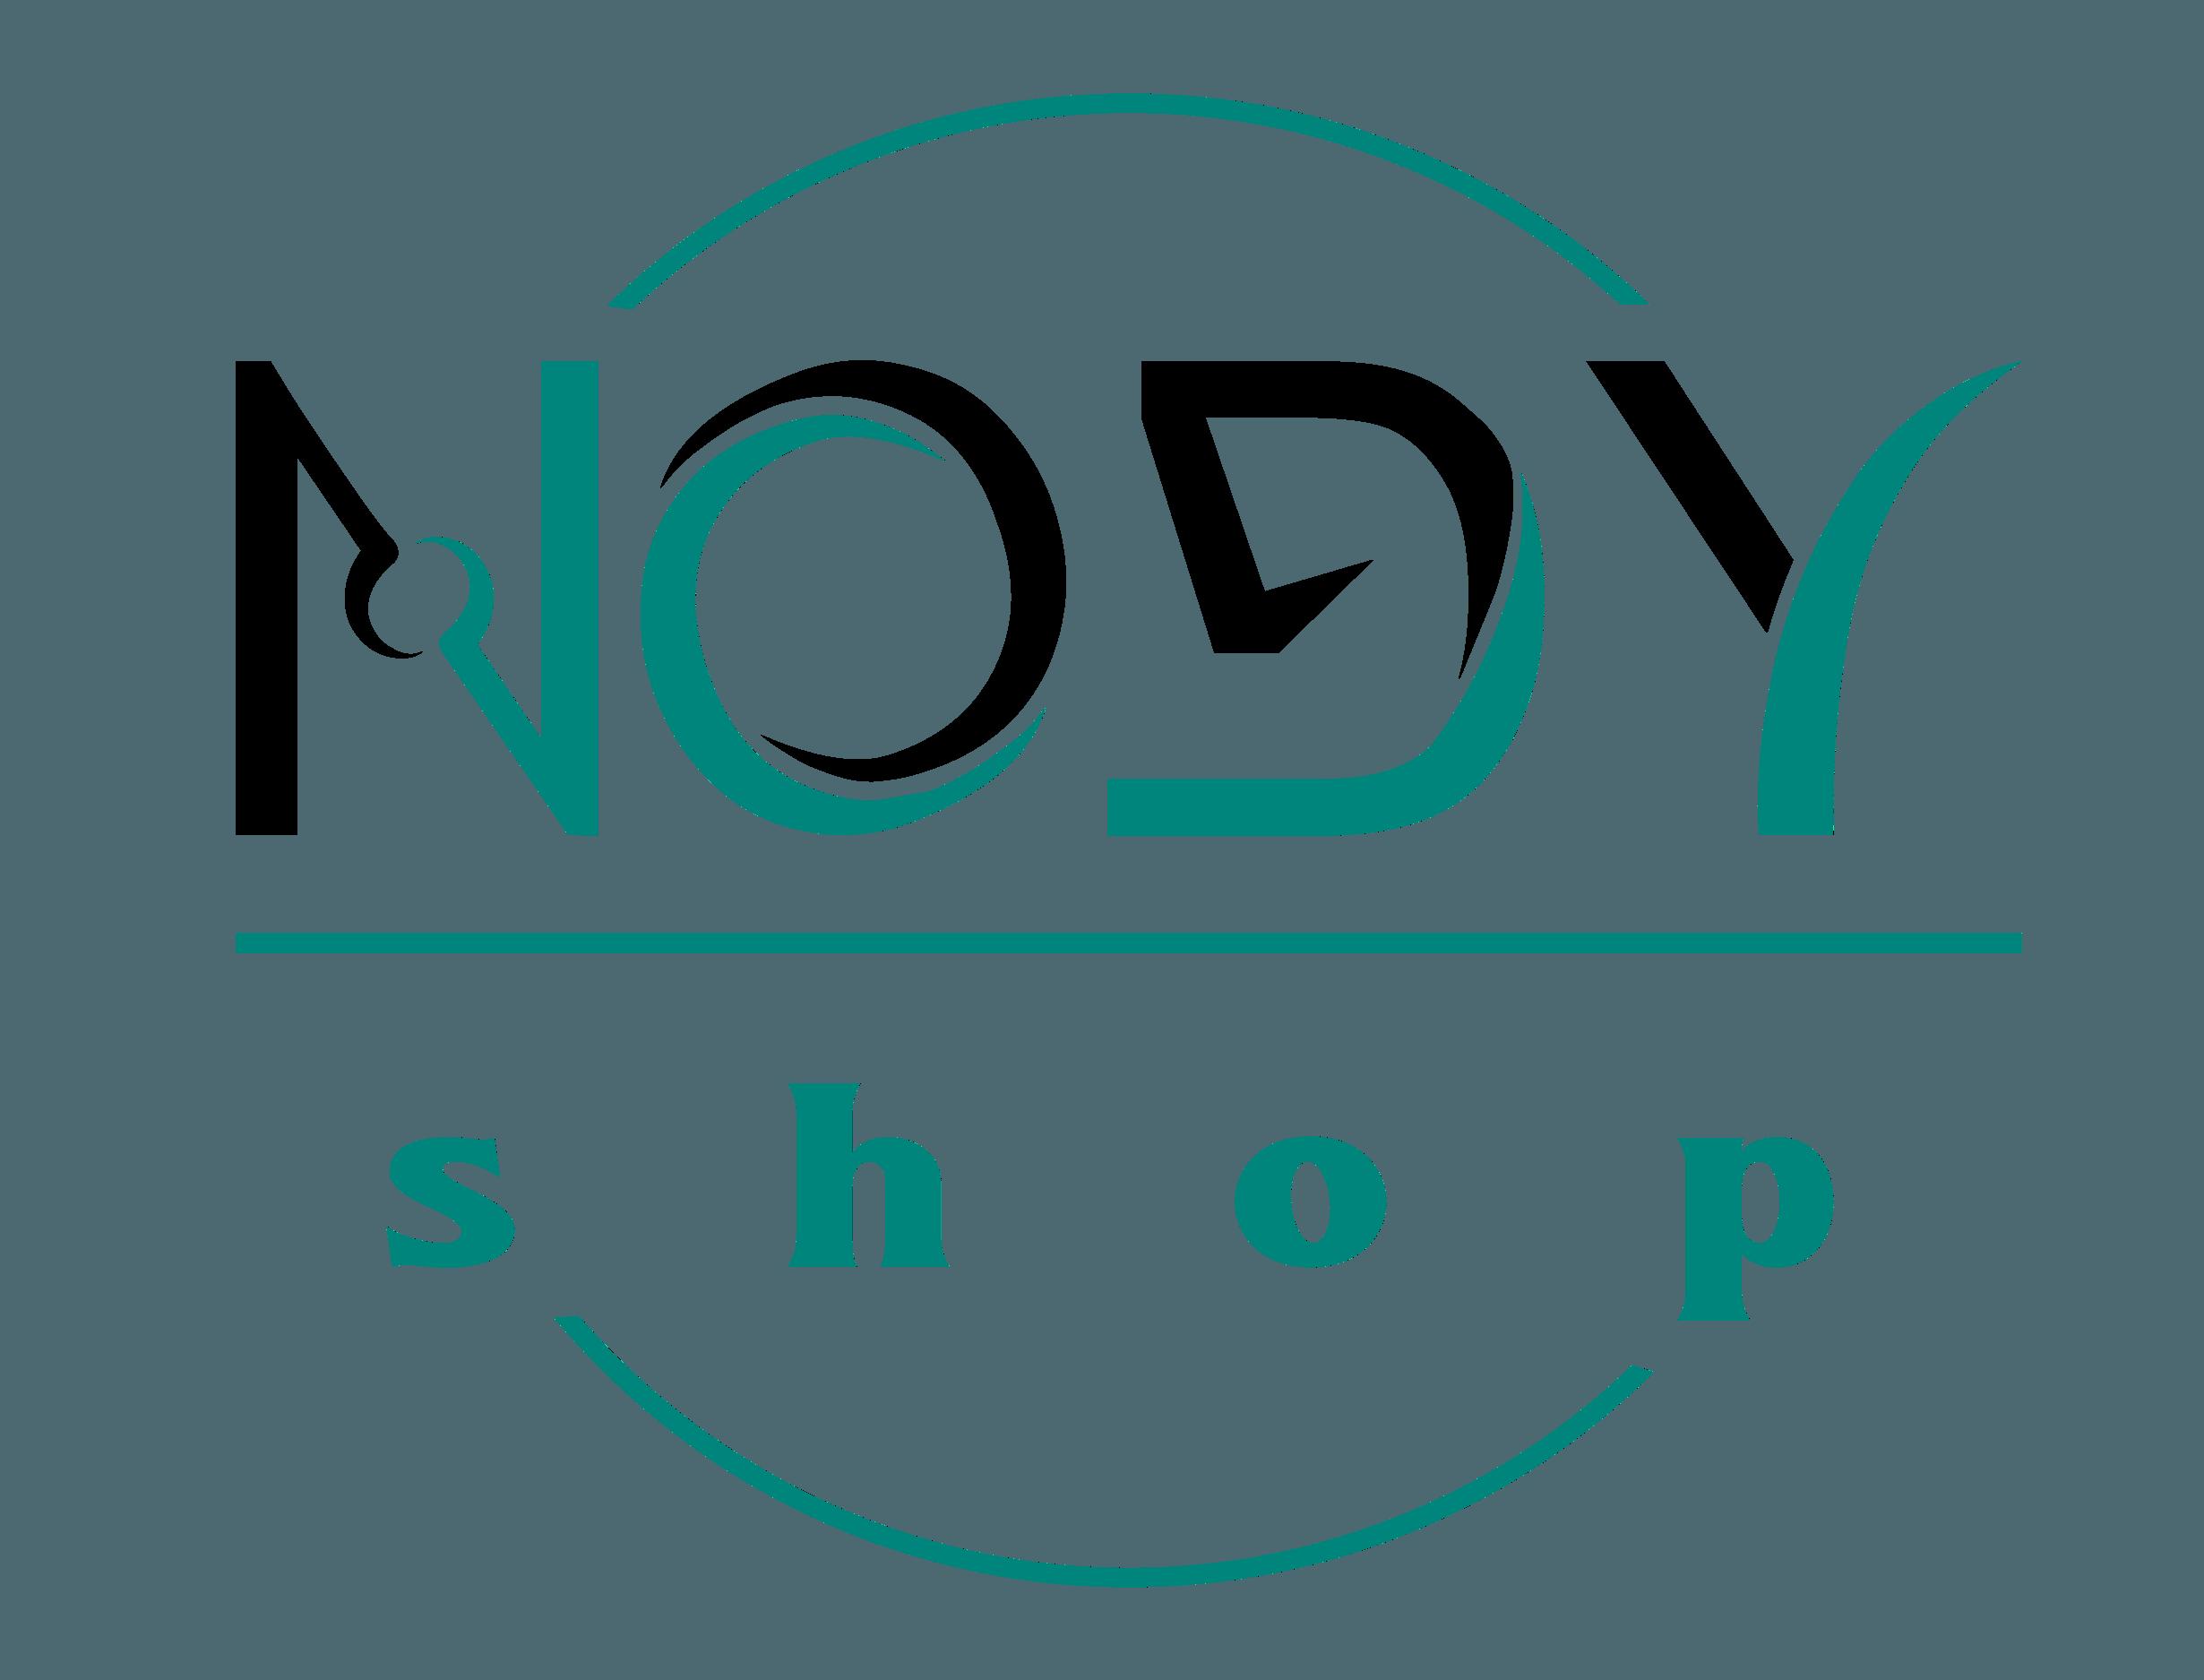 nody shop